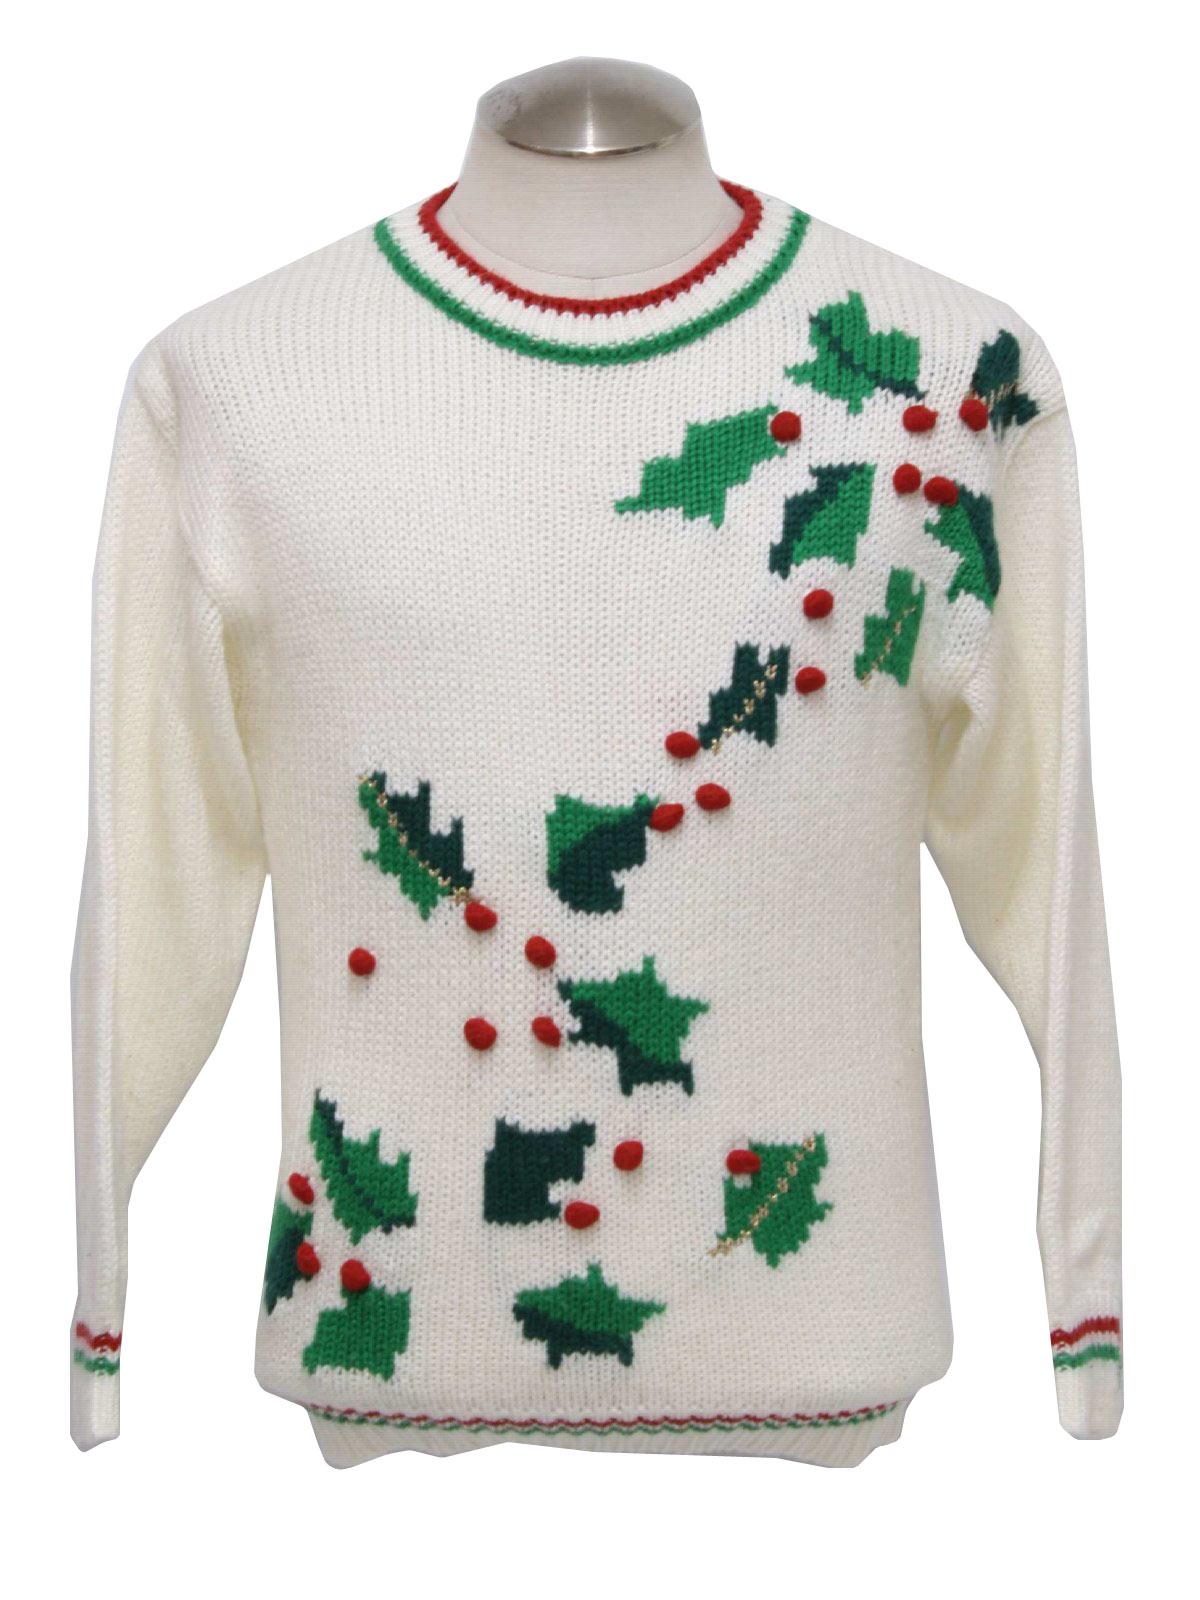 Ugly christmas sweater hasting smith unisex cream for Over the top ugly christmas sweaters